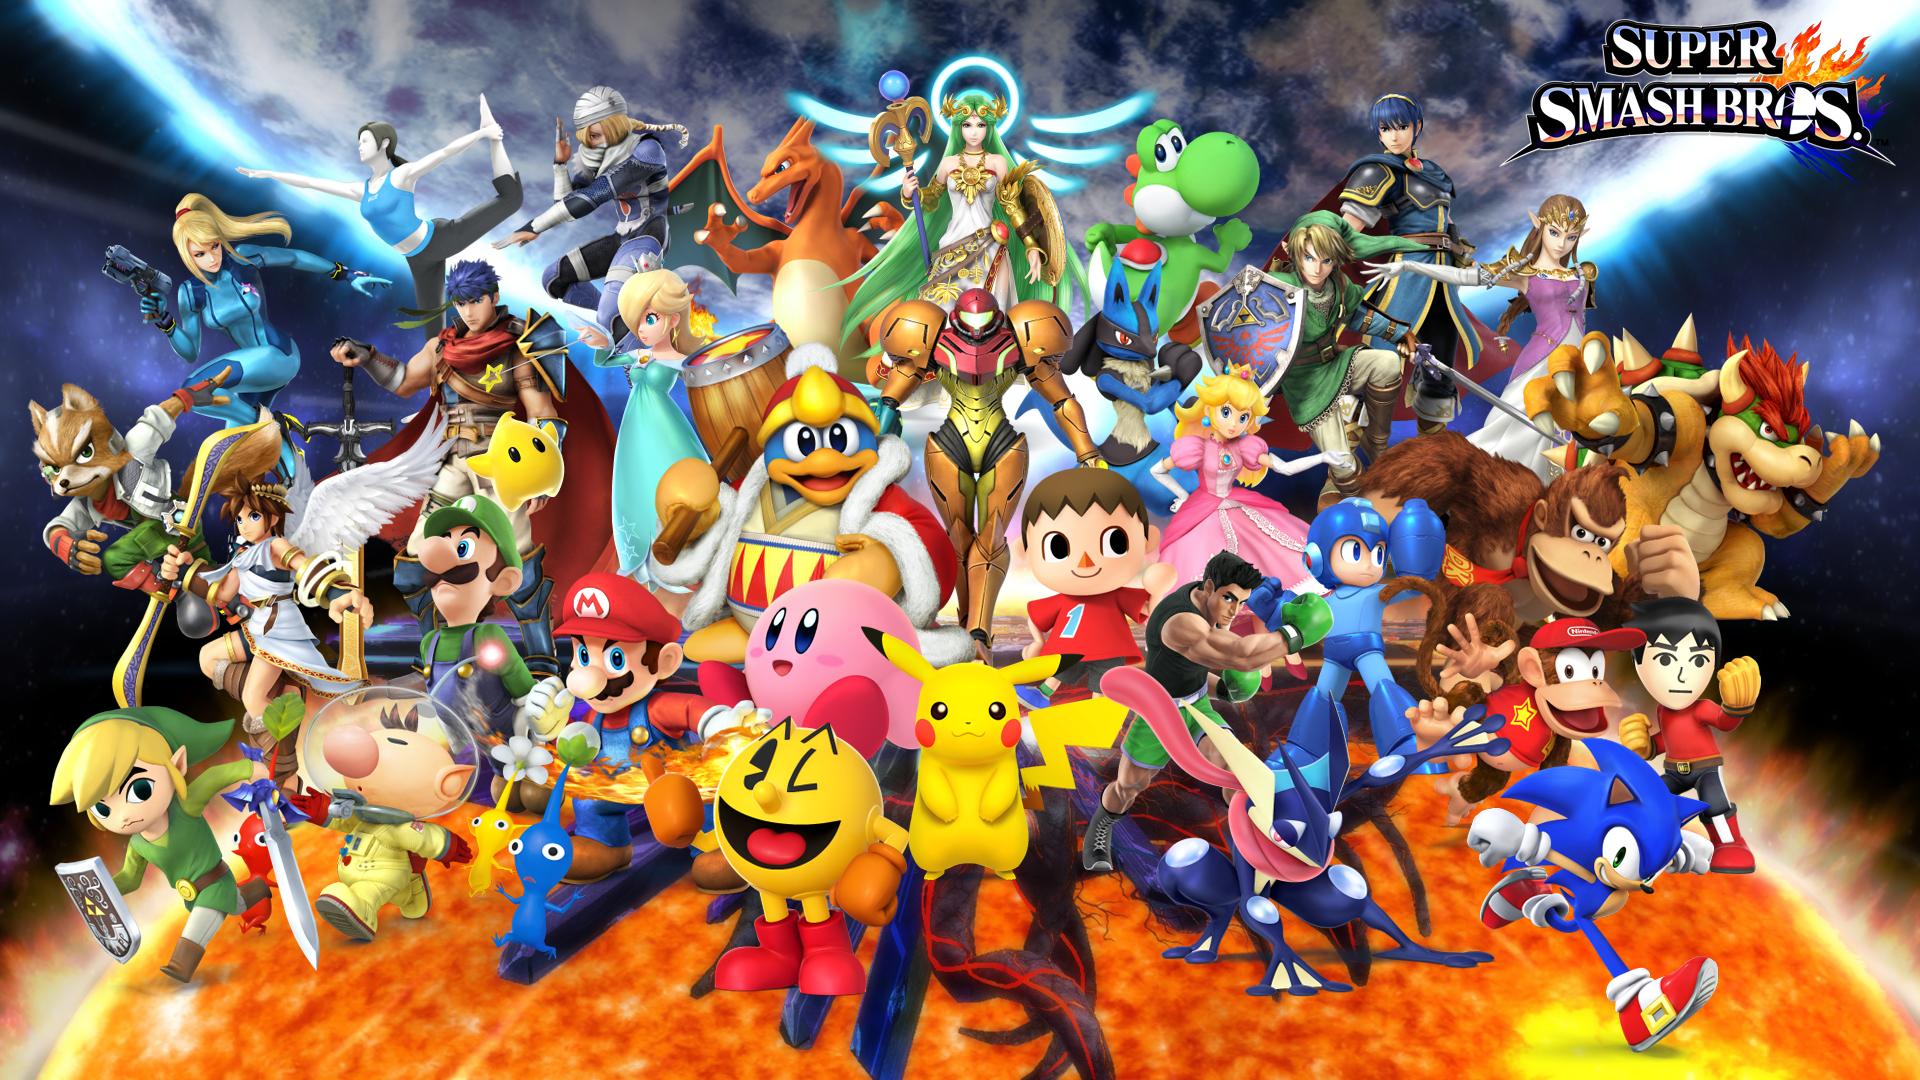 Free Download Super Smash Bros Wallpaper Maker Online Wallpapers